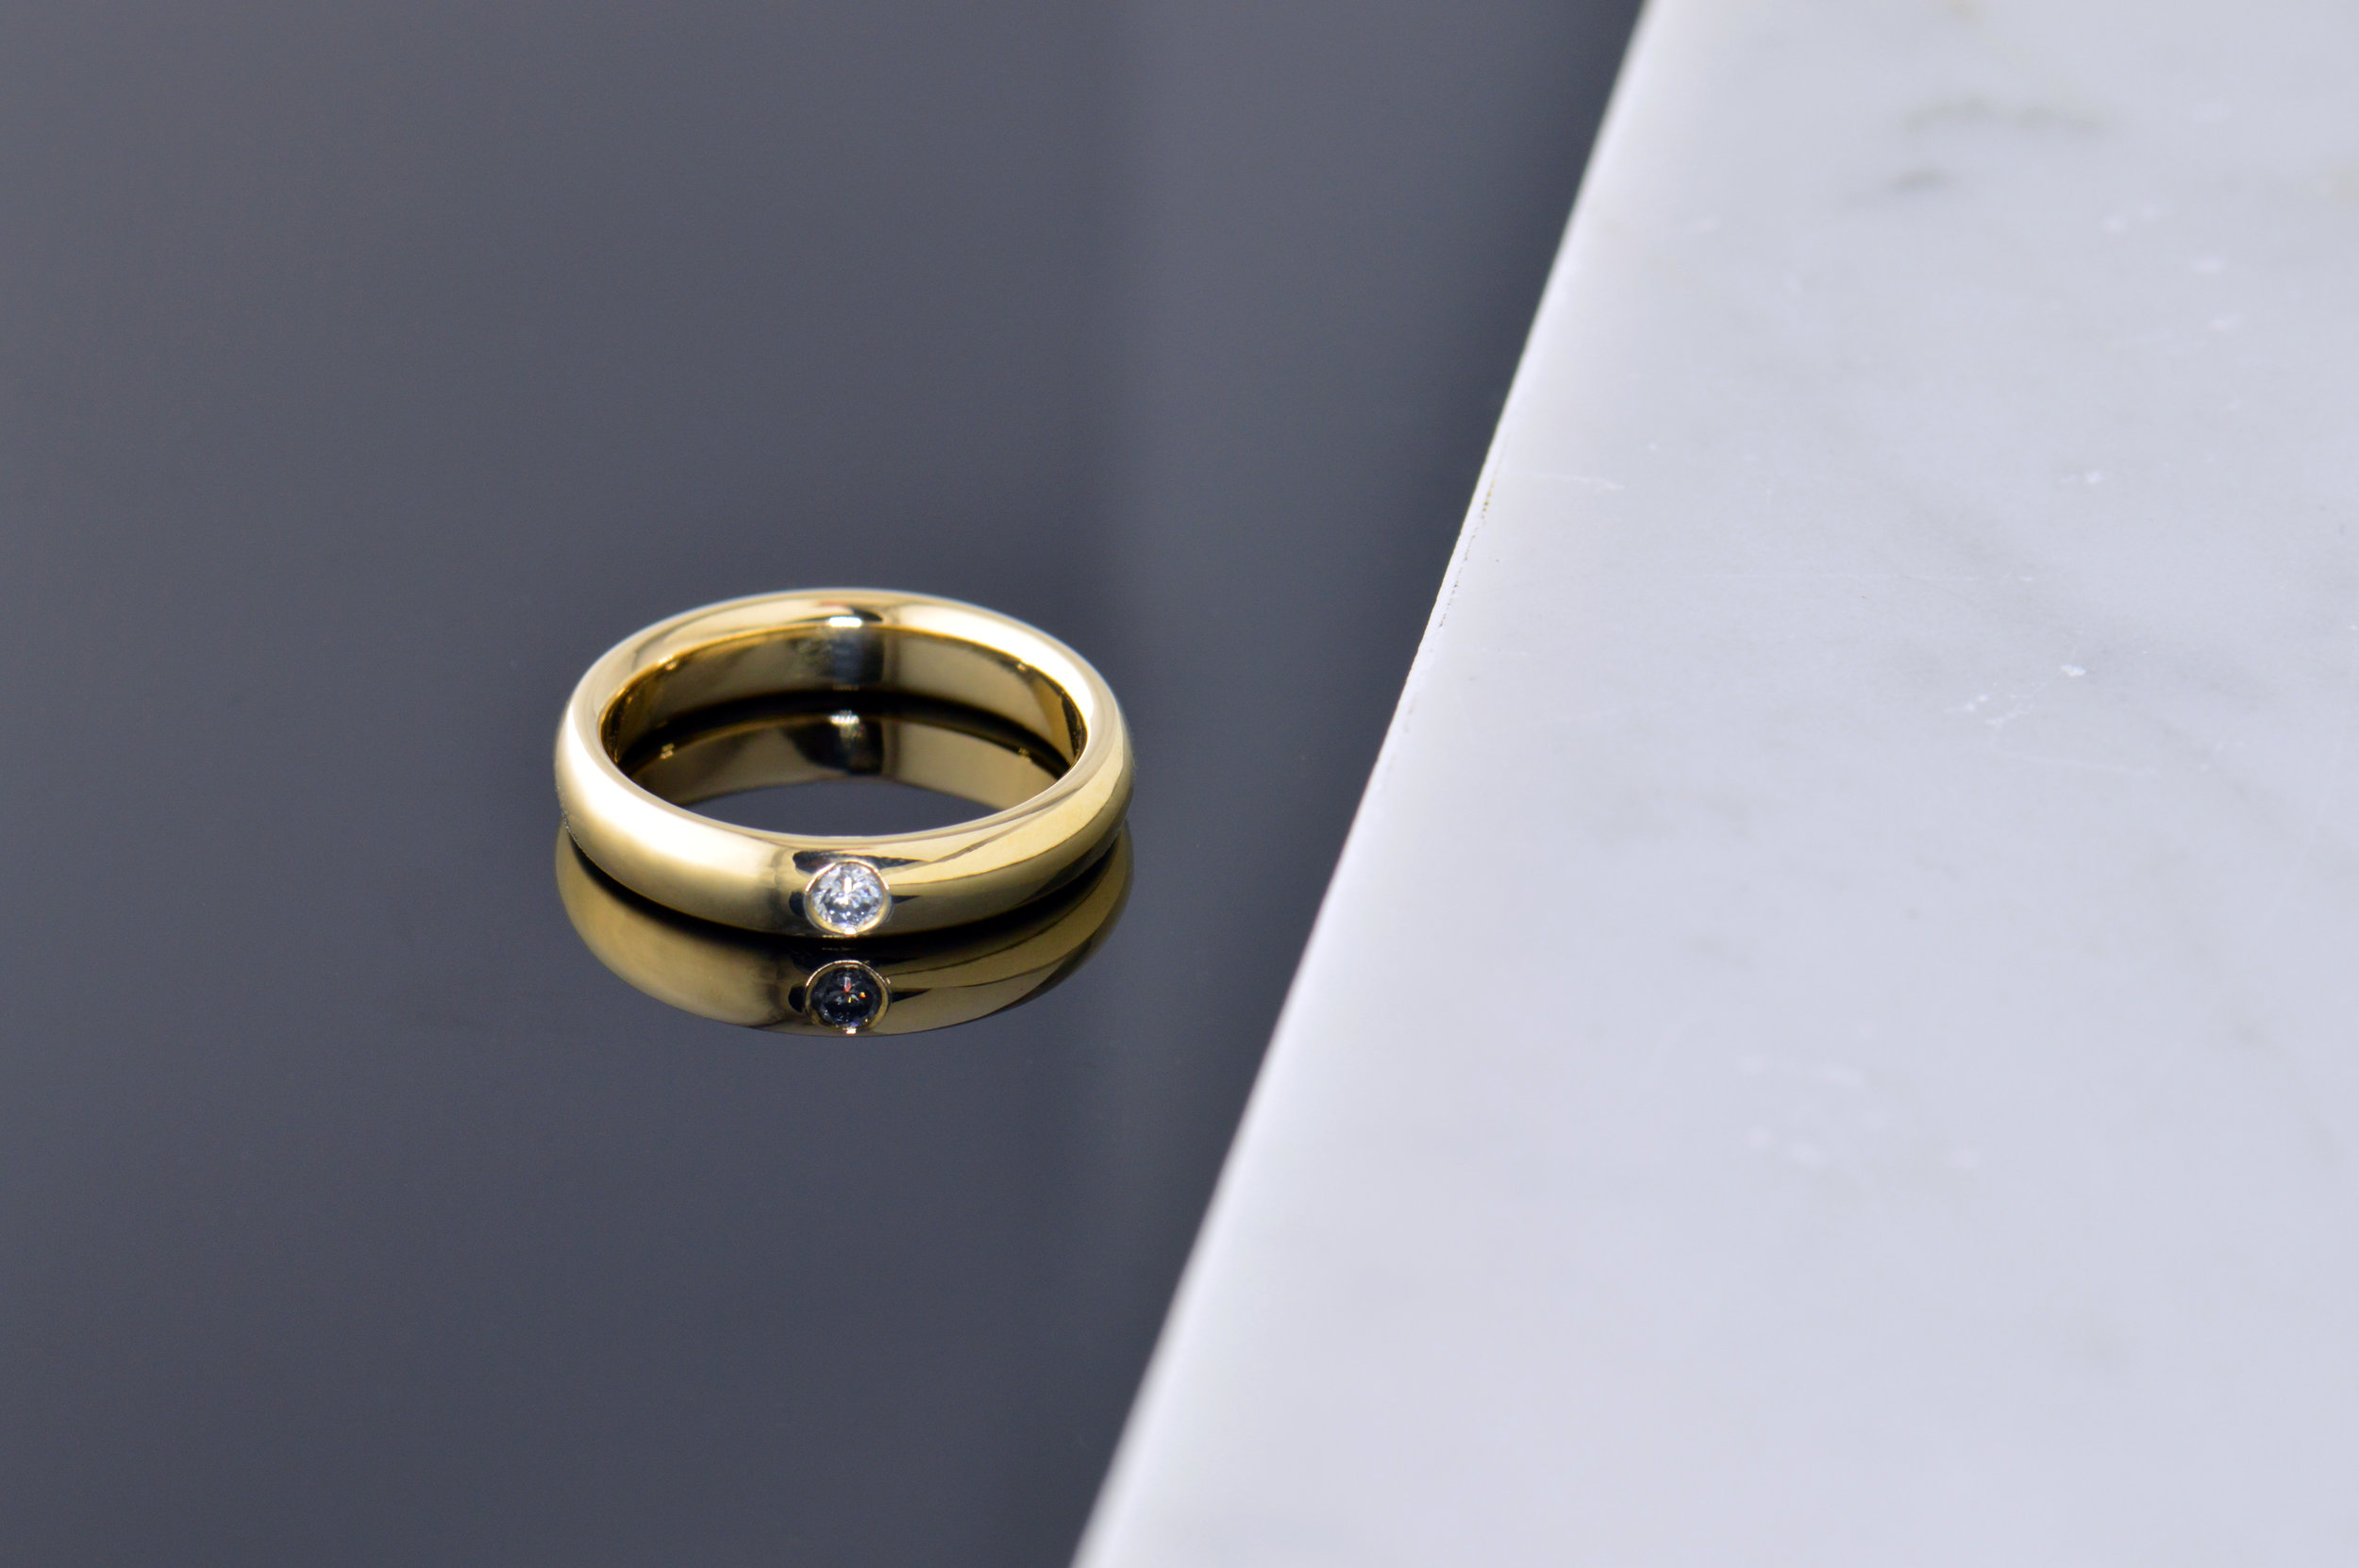 darvier-18k-diamond-wedding-band-minimalistic-flush-setting.JPG